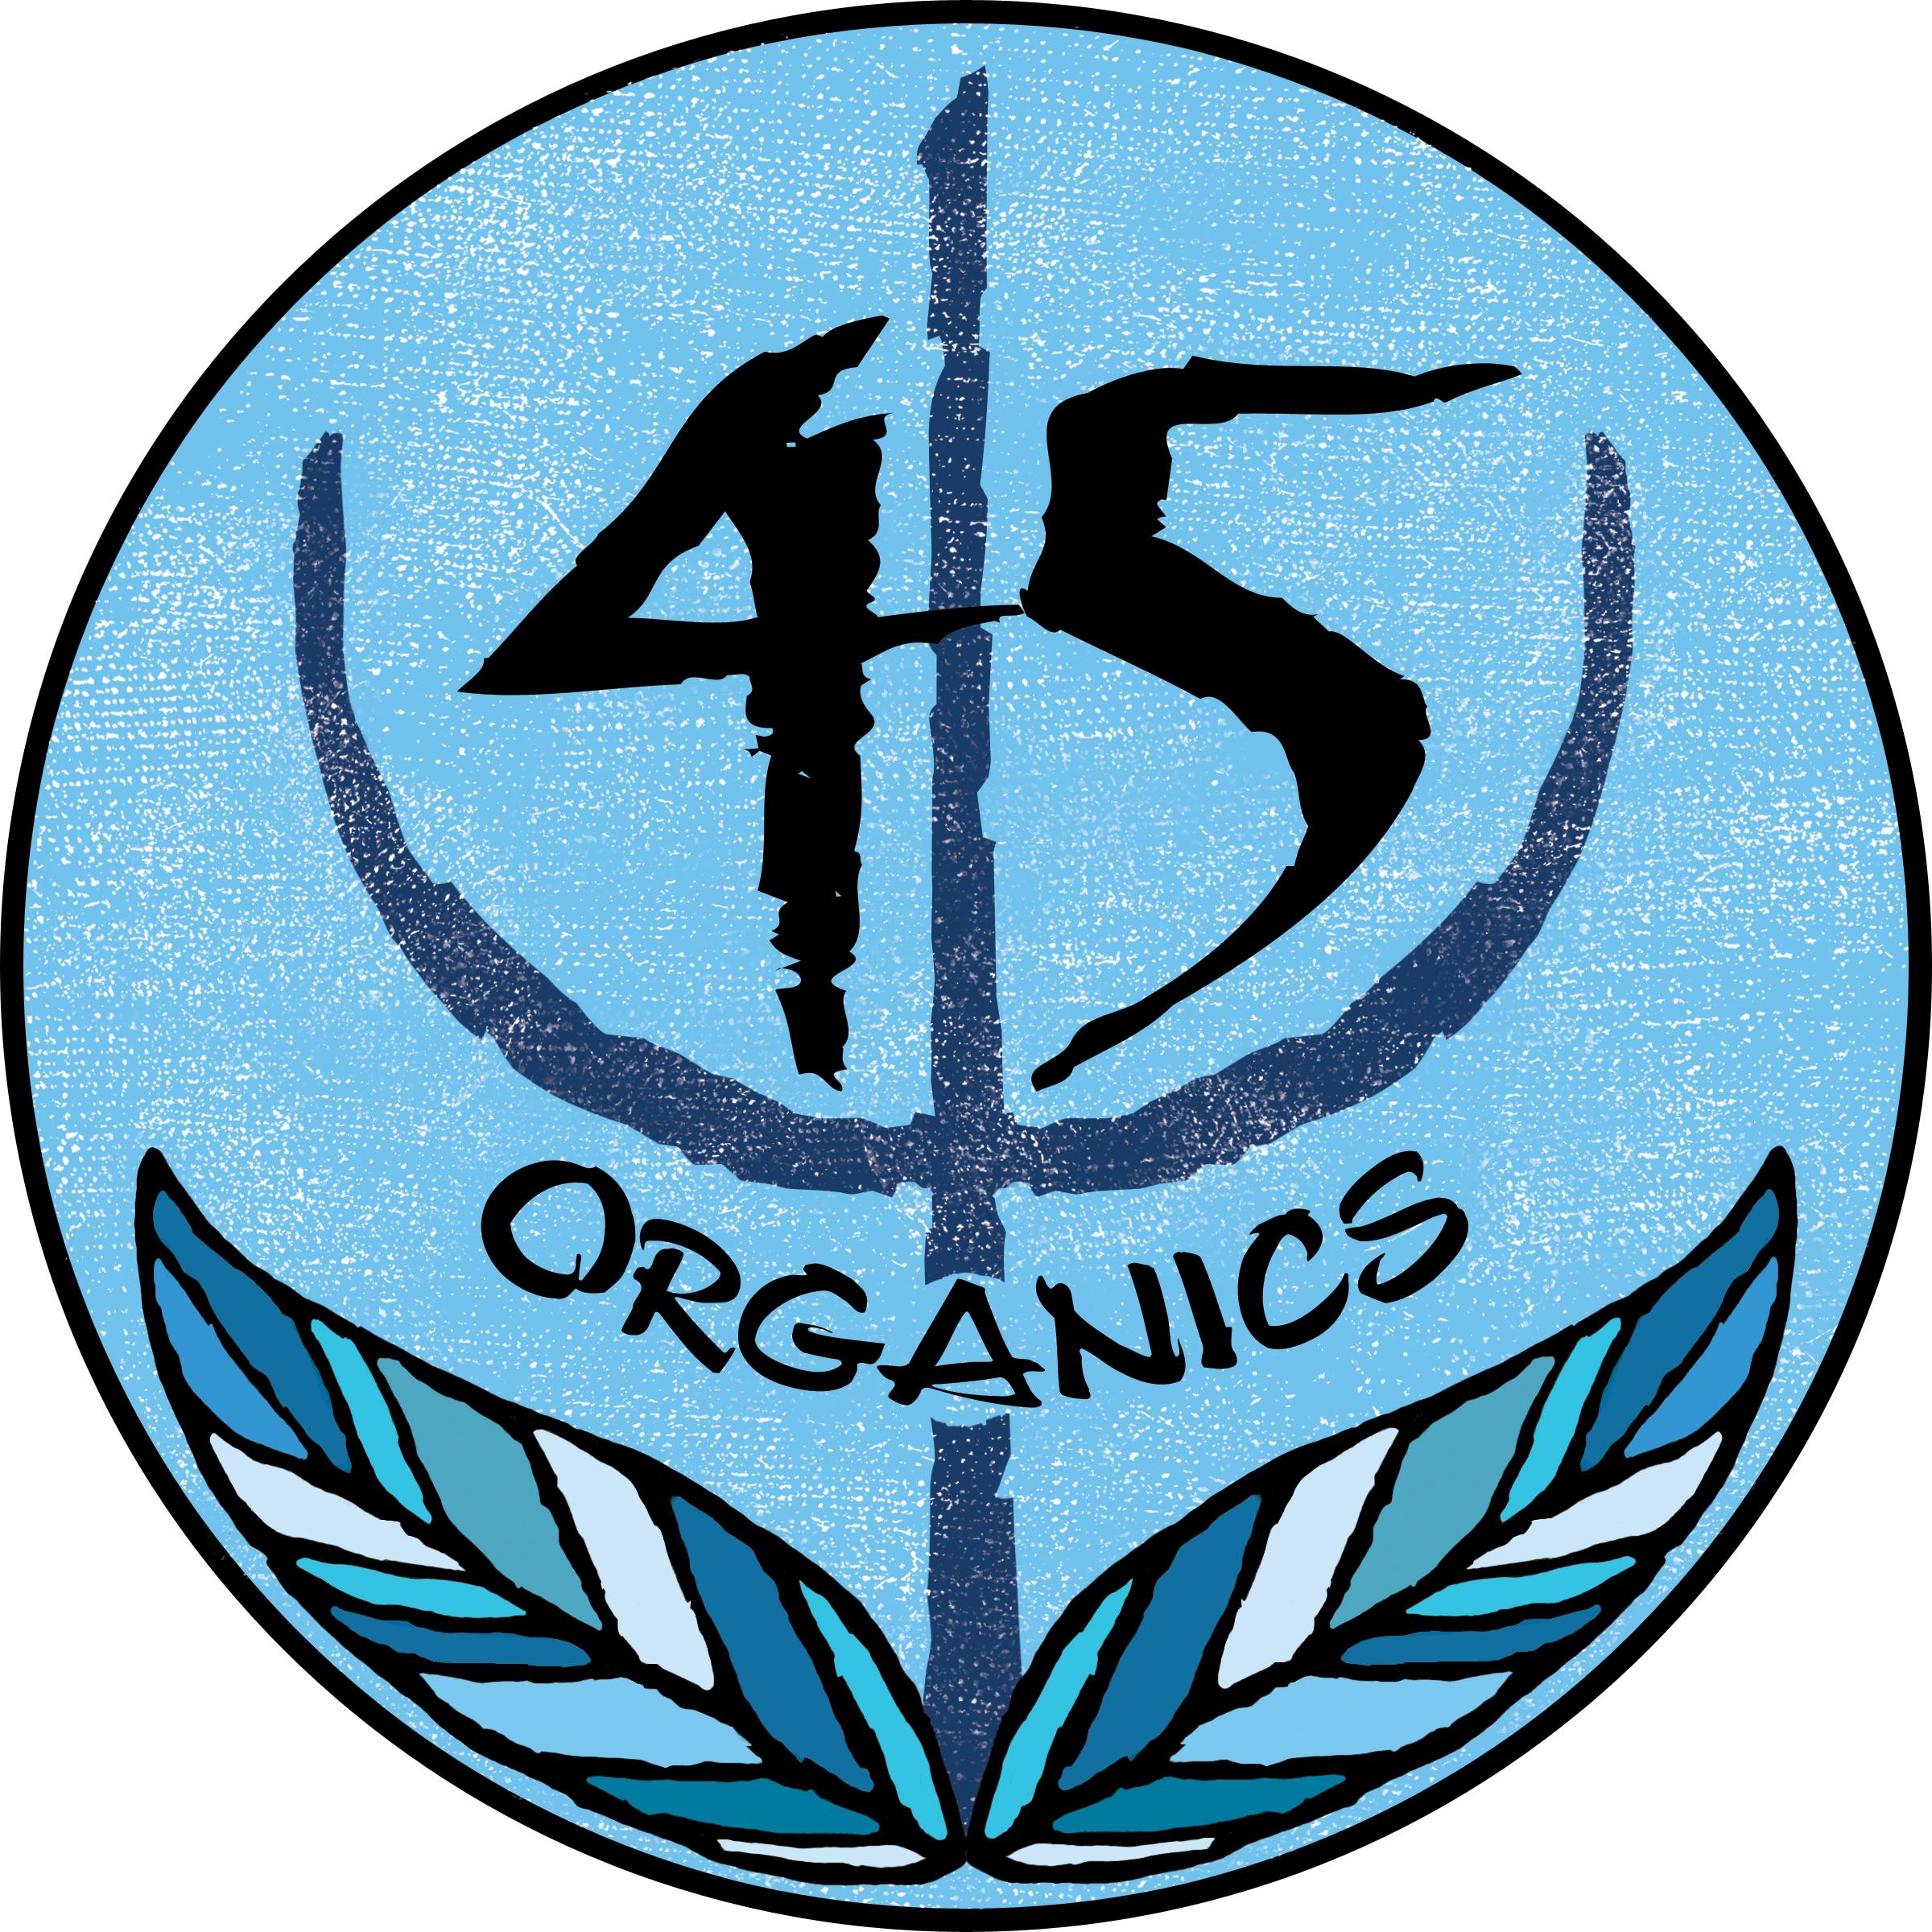 45 Organics